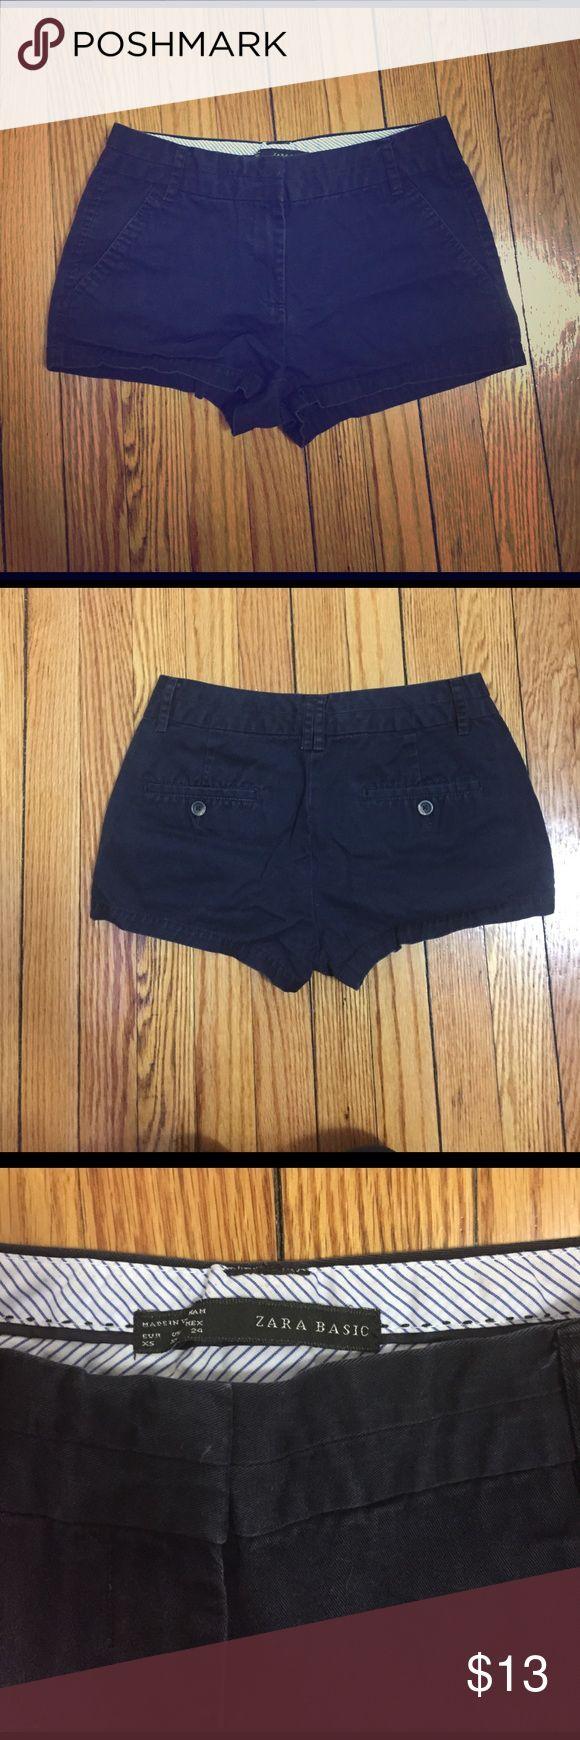 Zara Shorts Zara Shorts Zara Shorts Skorts